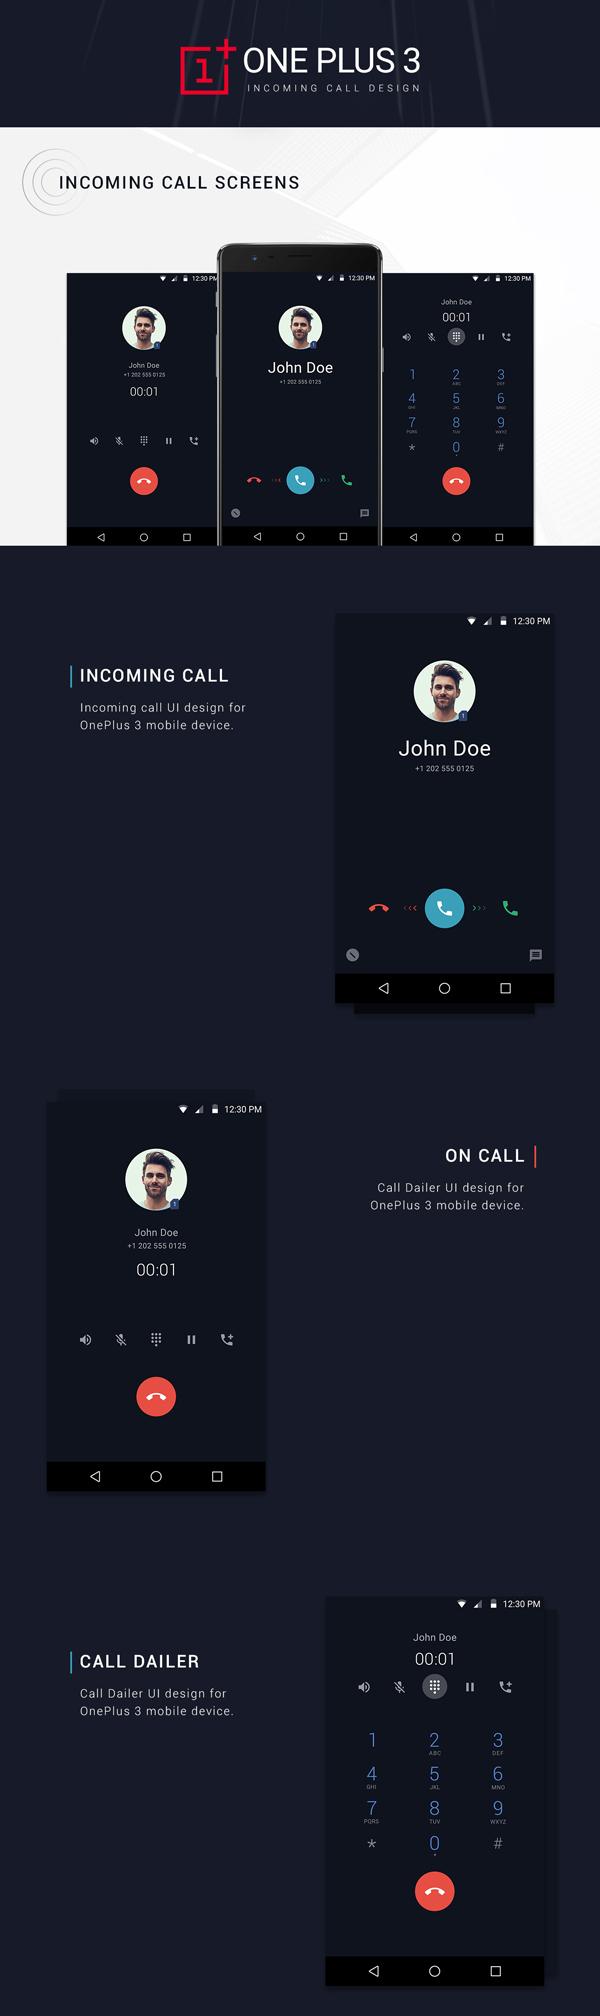 Free ONEPLUS Incoming Call UI Design PSD Template